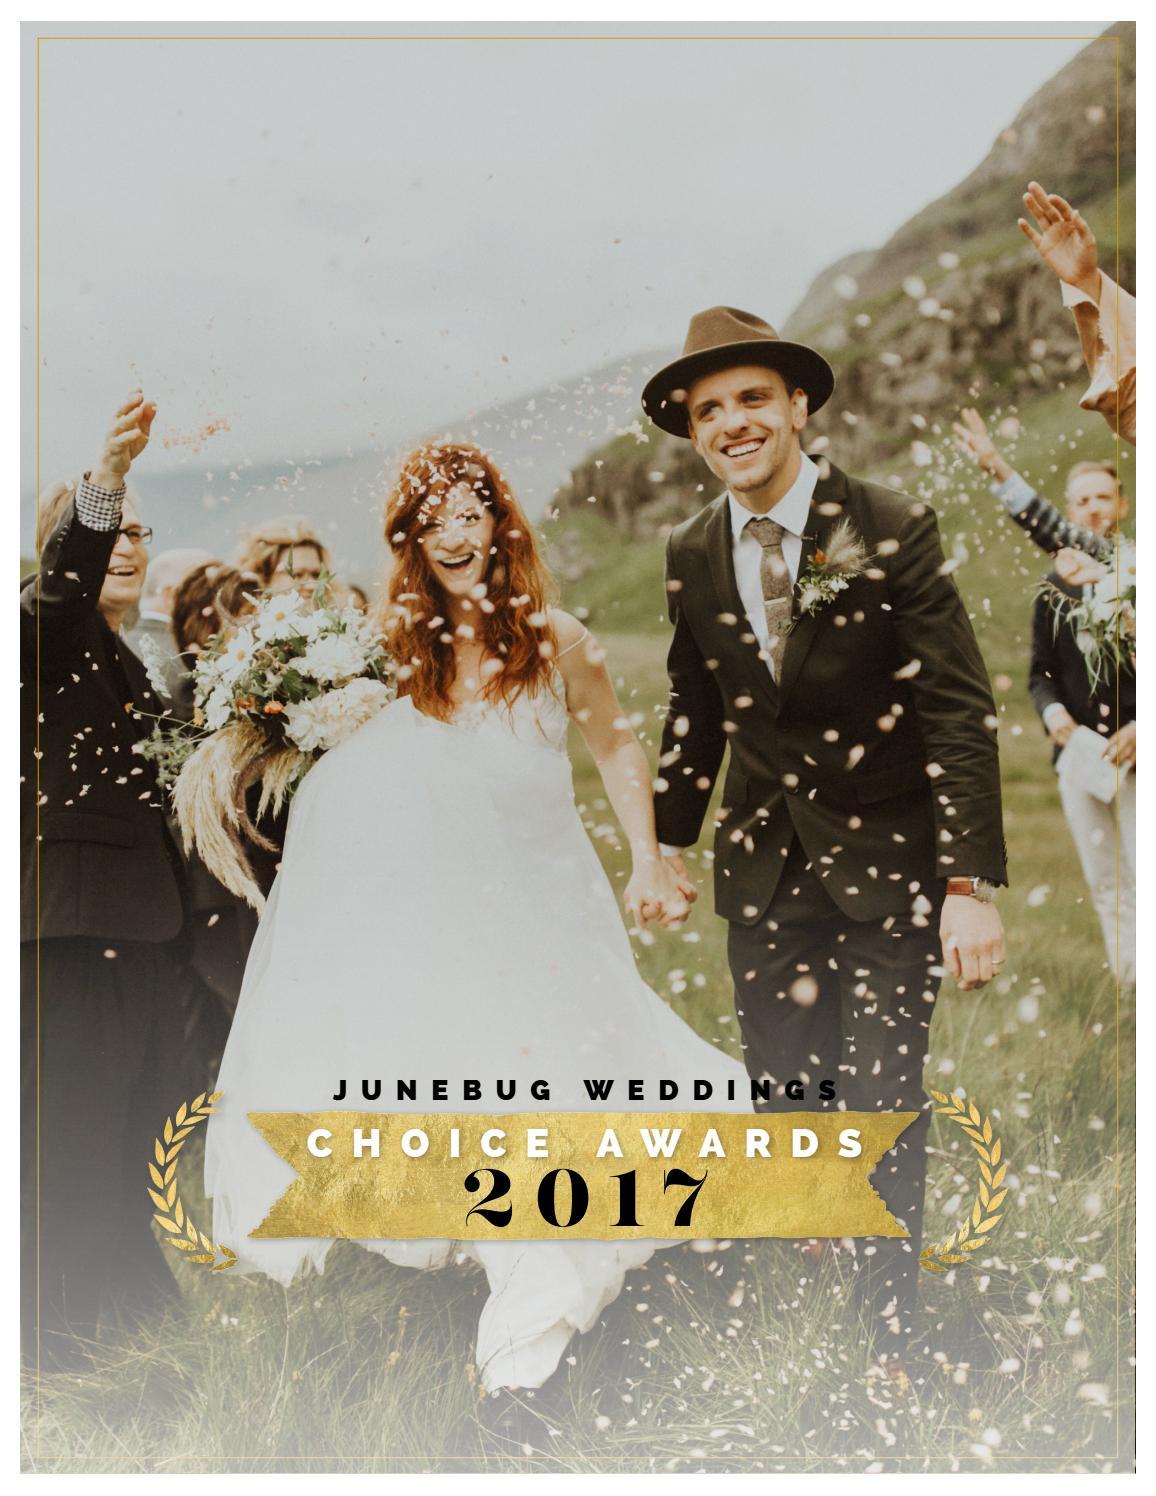 2017 Choice Awards by Junebug Weddings by Junebug Weddings - issuu